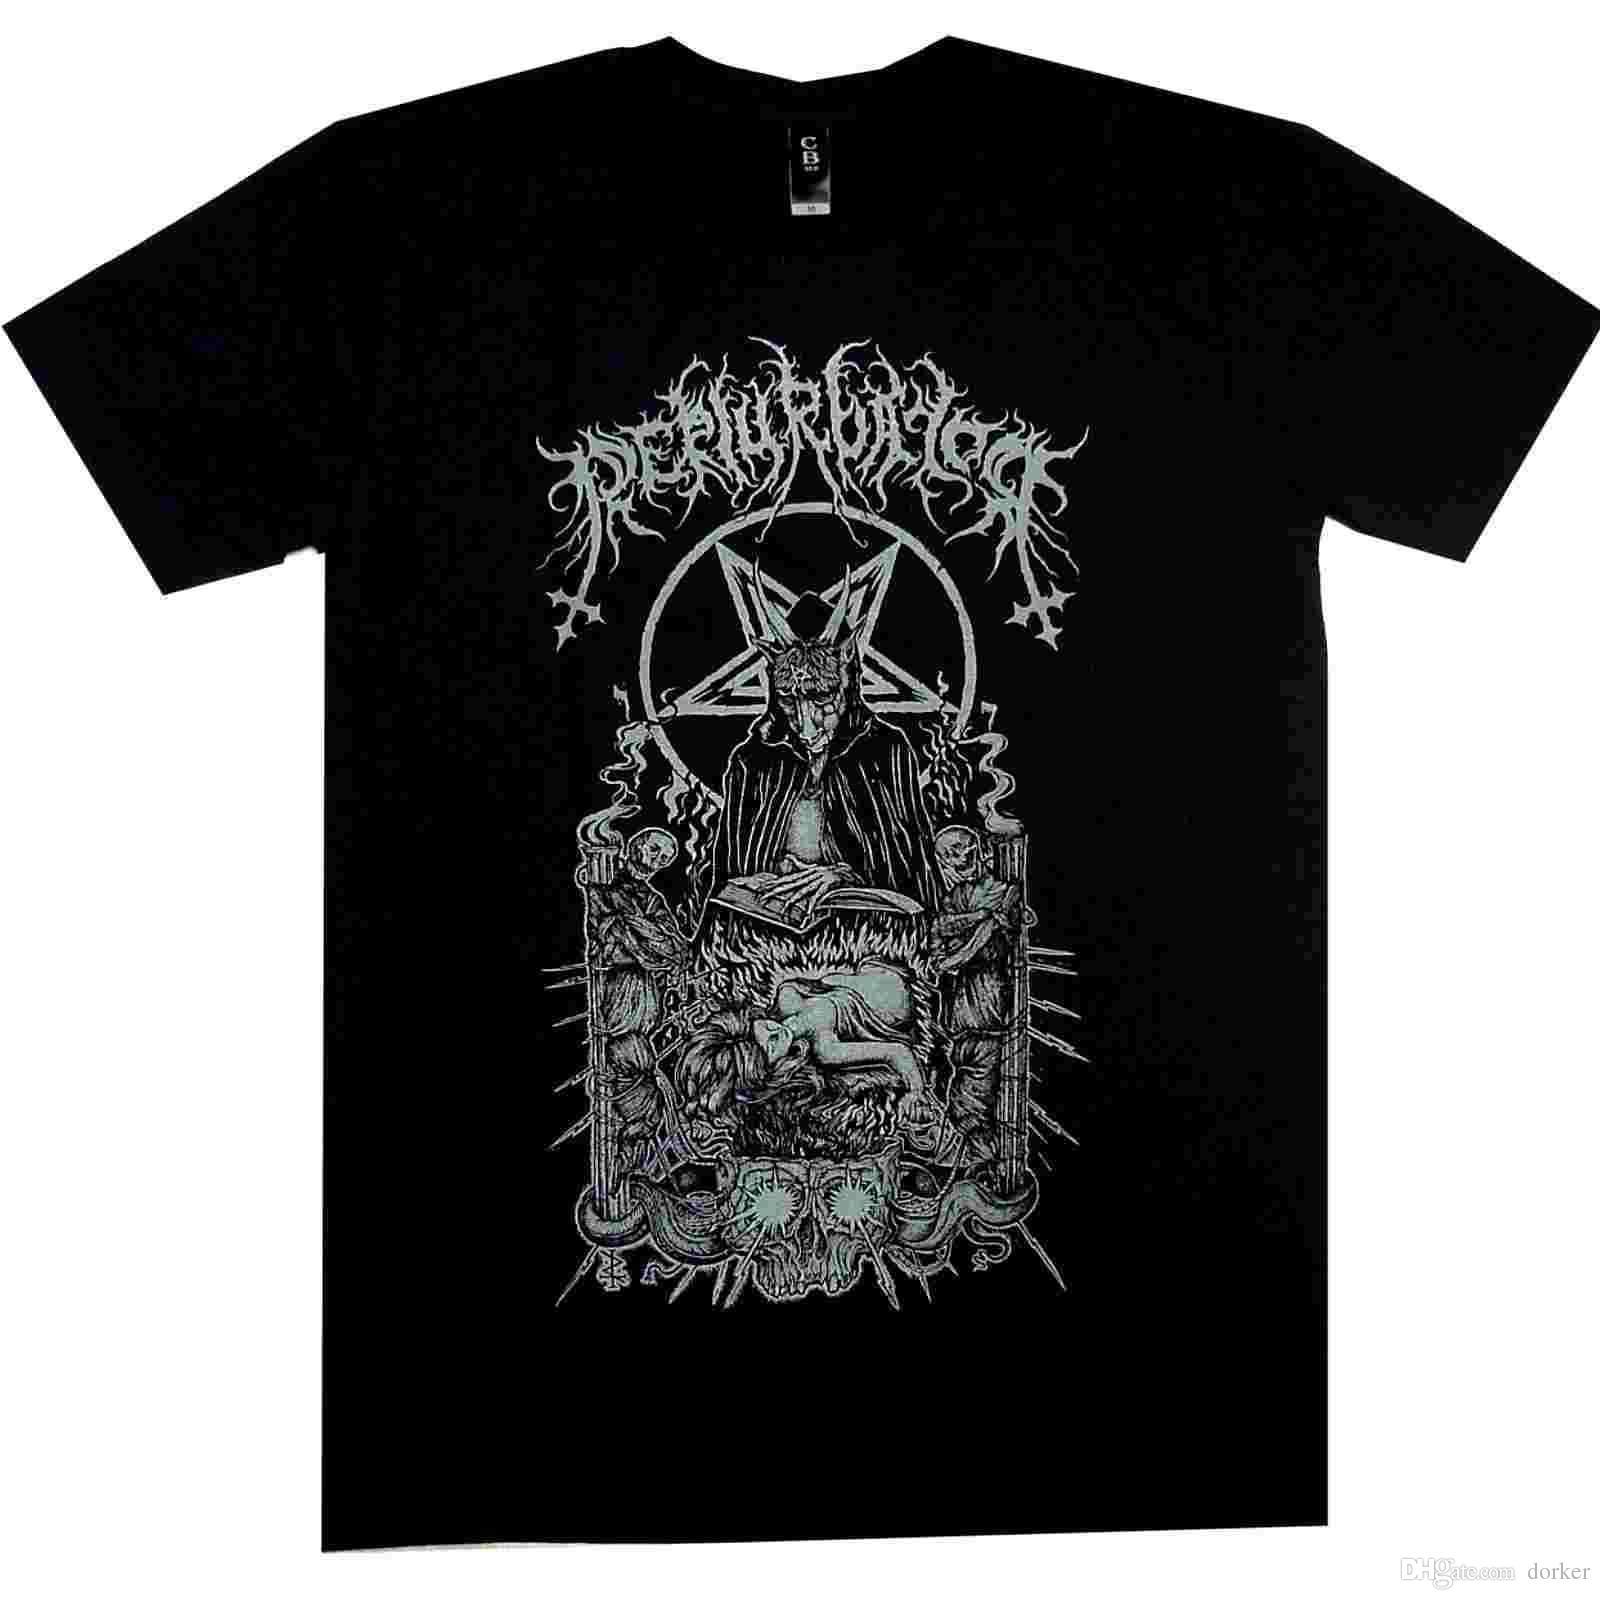 8facc4e92 Perturbator Business Met Satan Shirt Ml Officiële Tshirt Dark Wave T Shirt  Buy Cool T Shirts Online Funny Offensive T Shirts From Dorker, $10.72   DHgate.Com